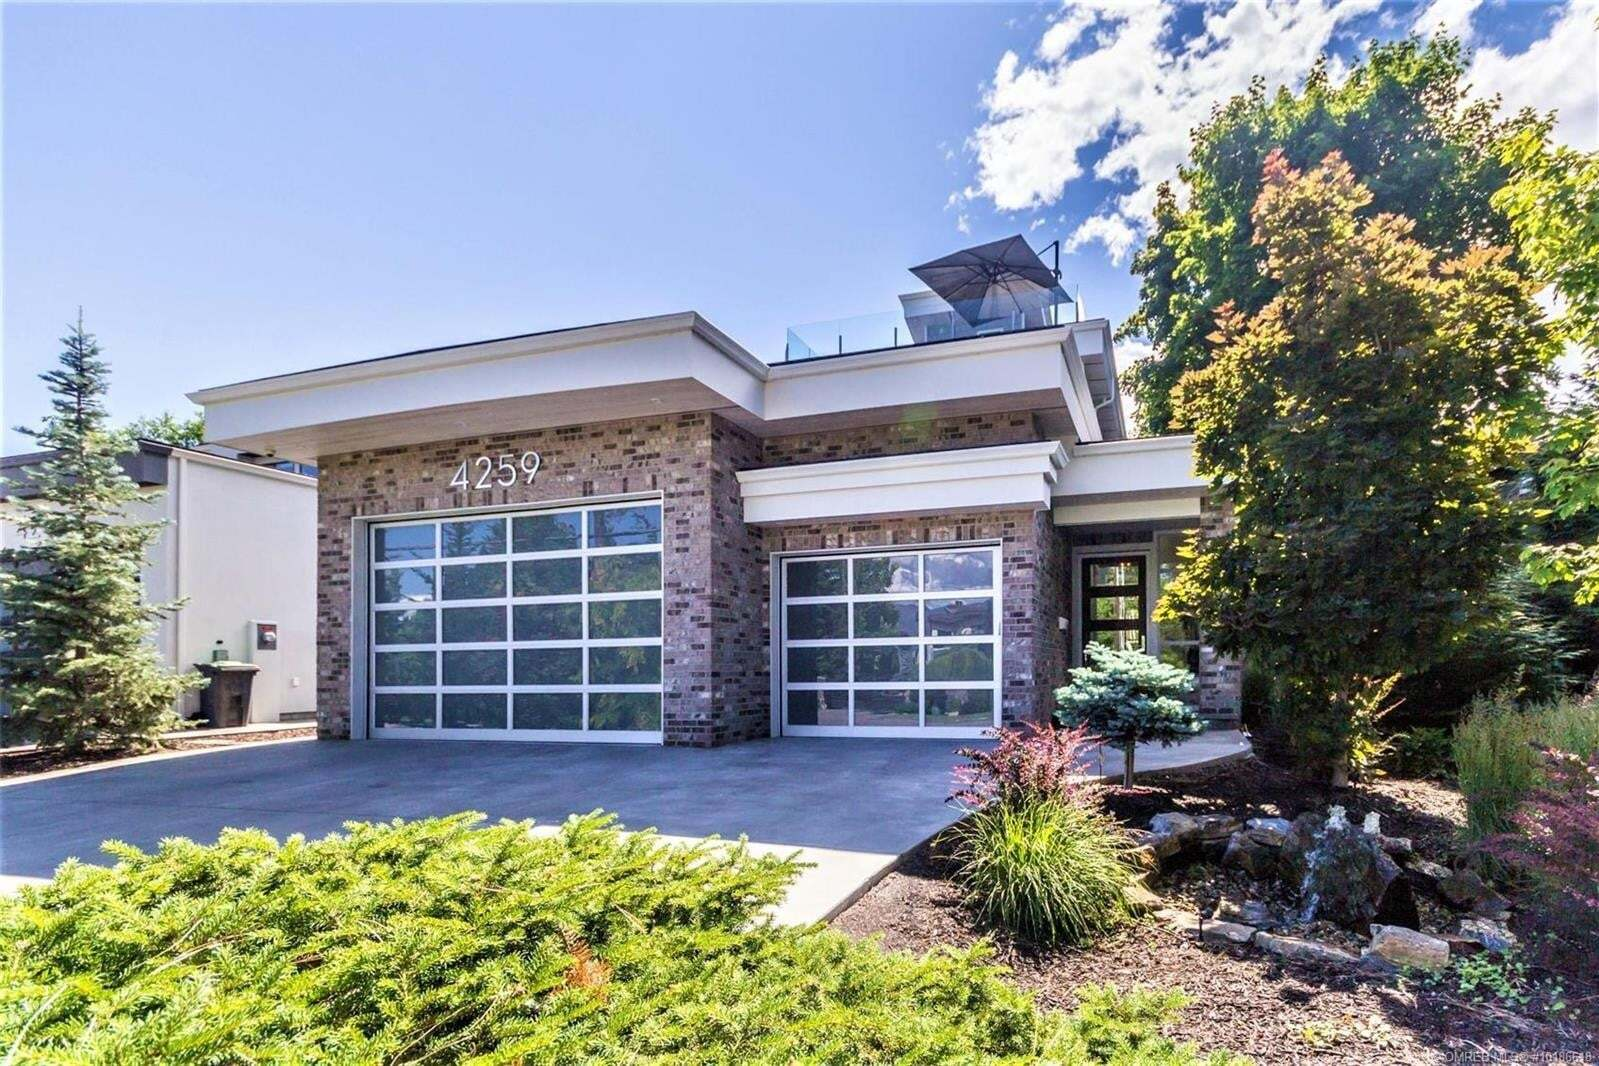 House for sale at 4259 Hobson Rd Kelowna British Columbia - MLS: 10186618